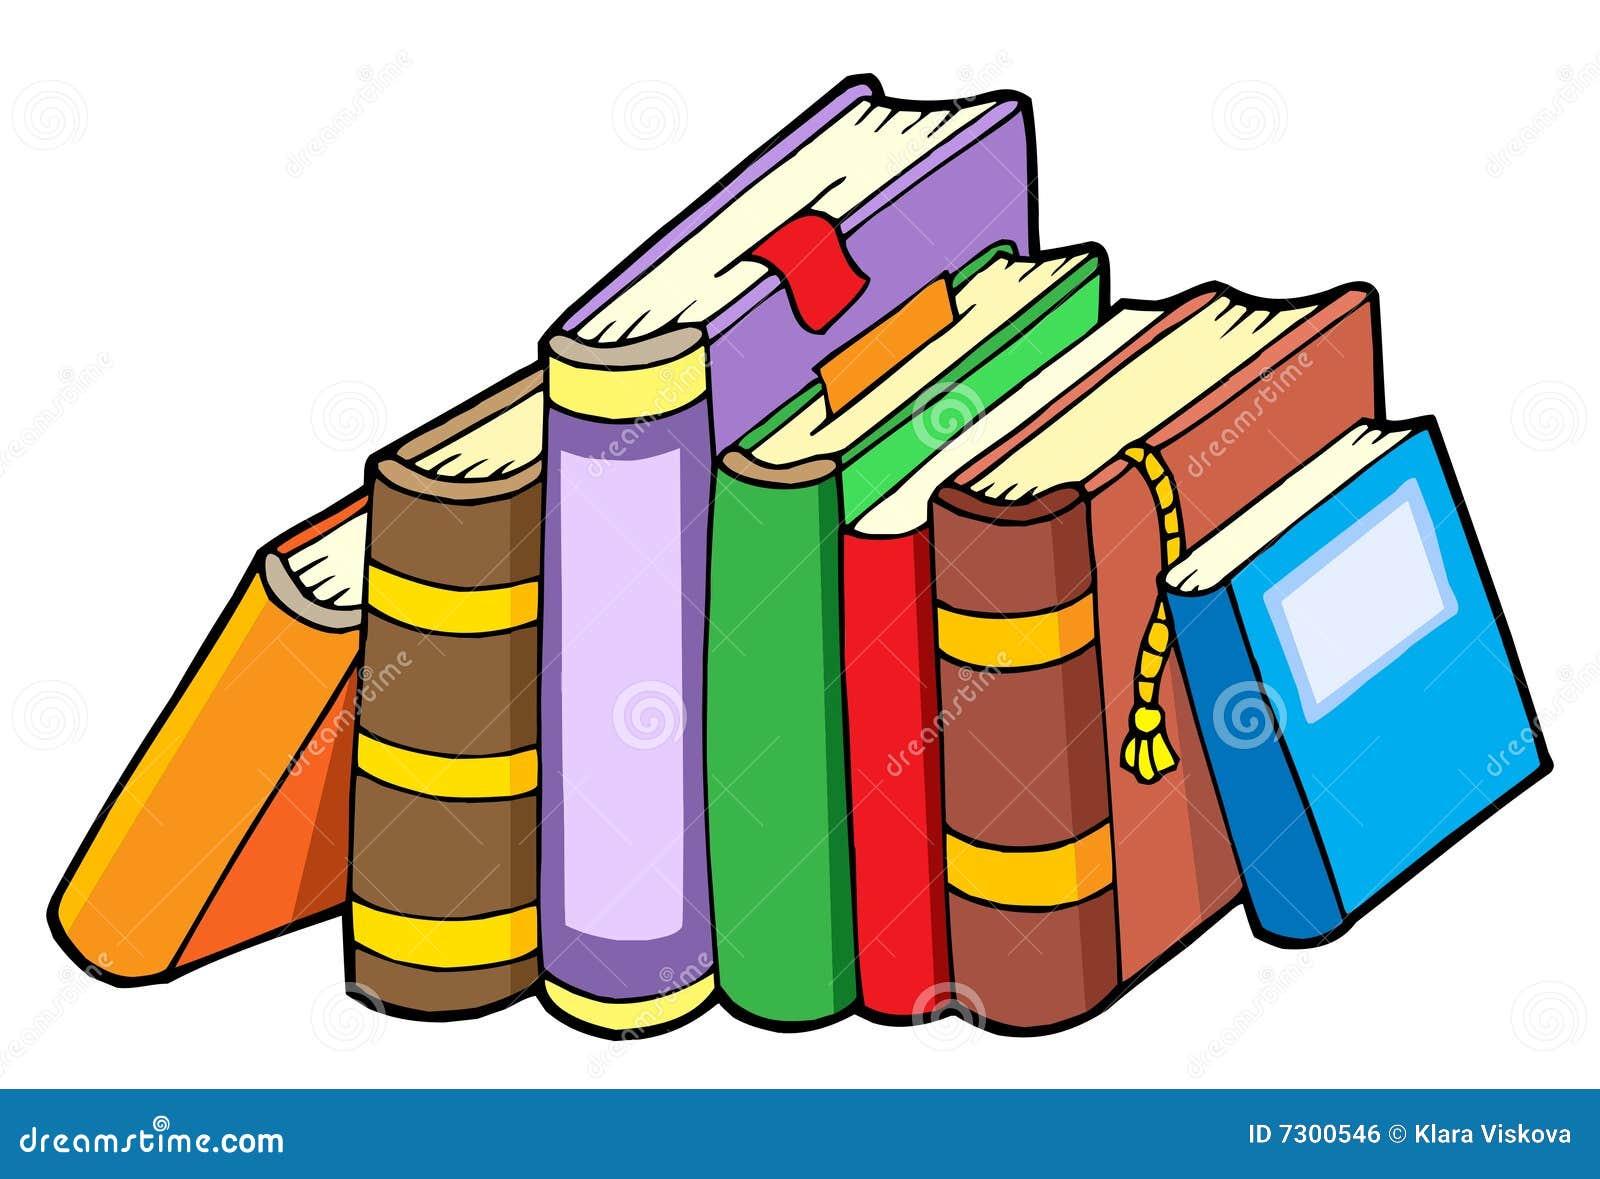 line of various books stock vector illustration of books books clipart transparent background books clipart transparent background